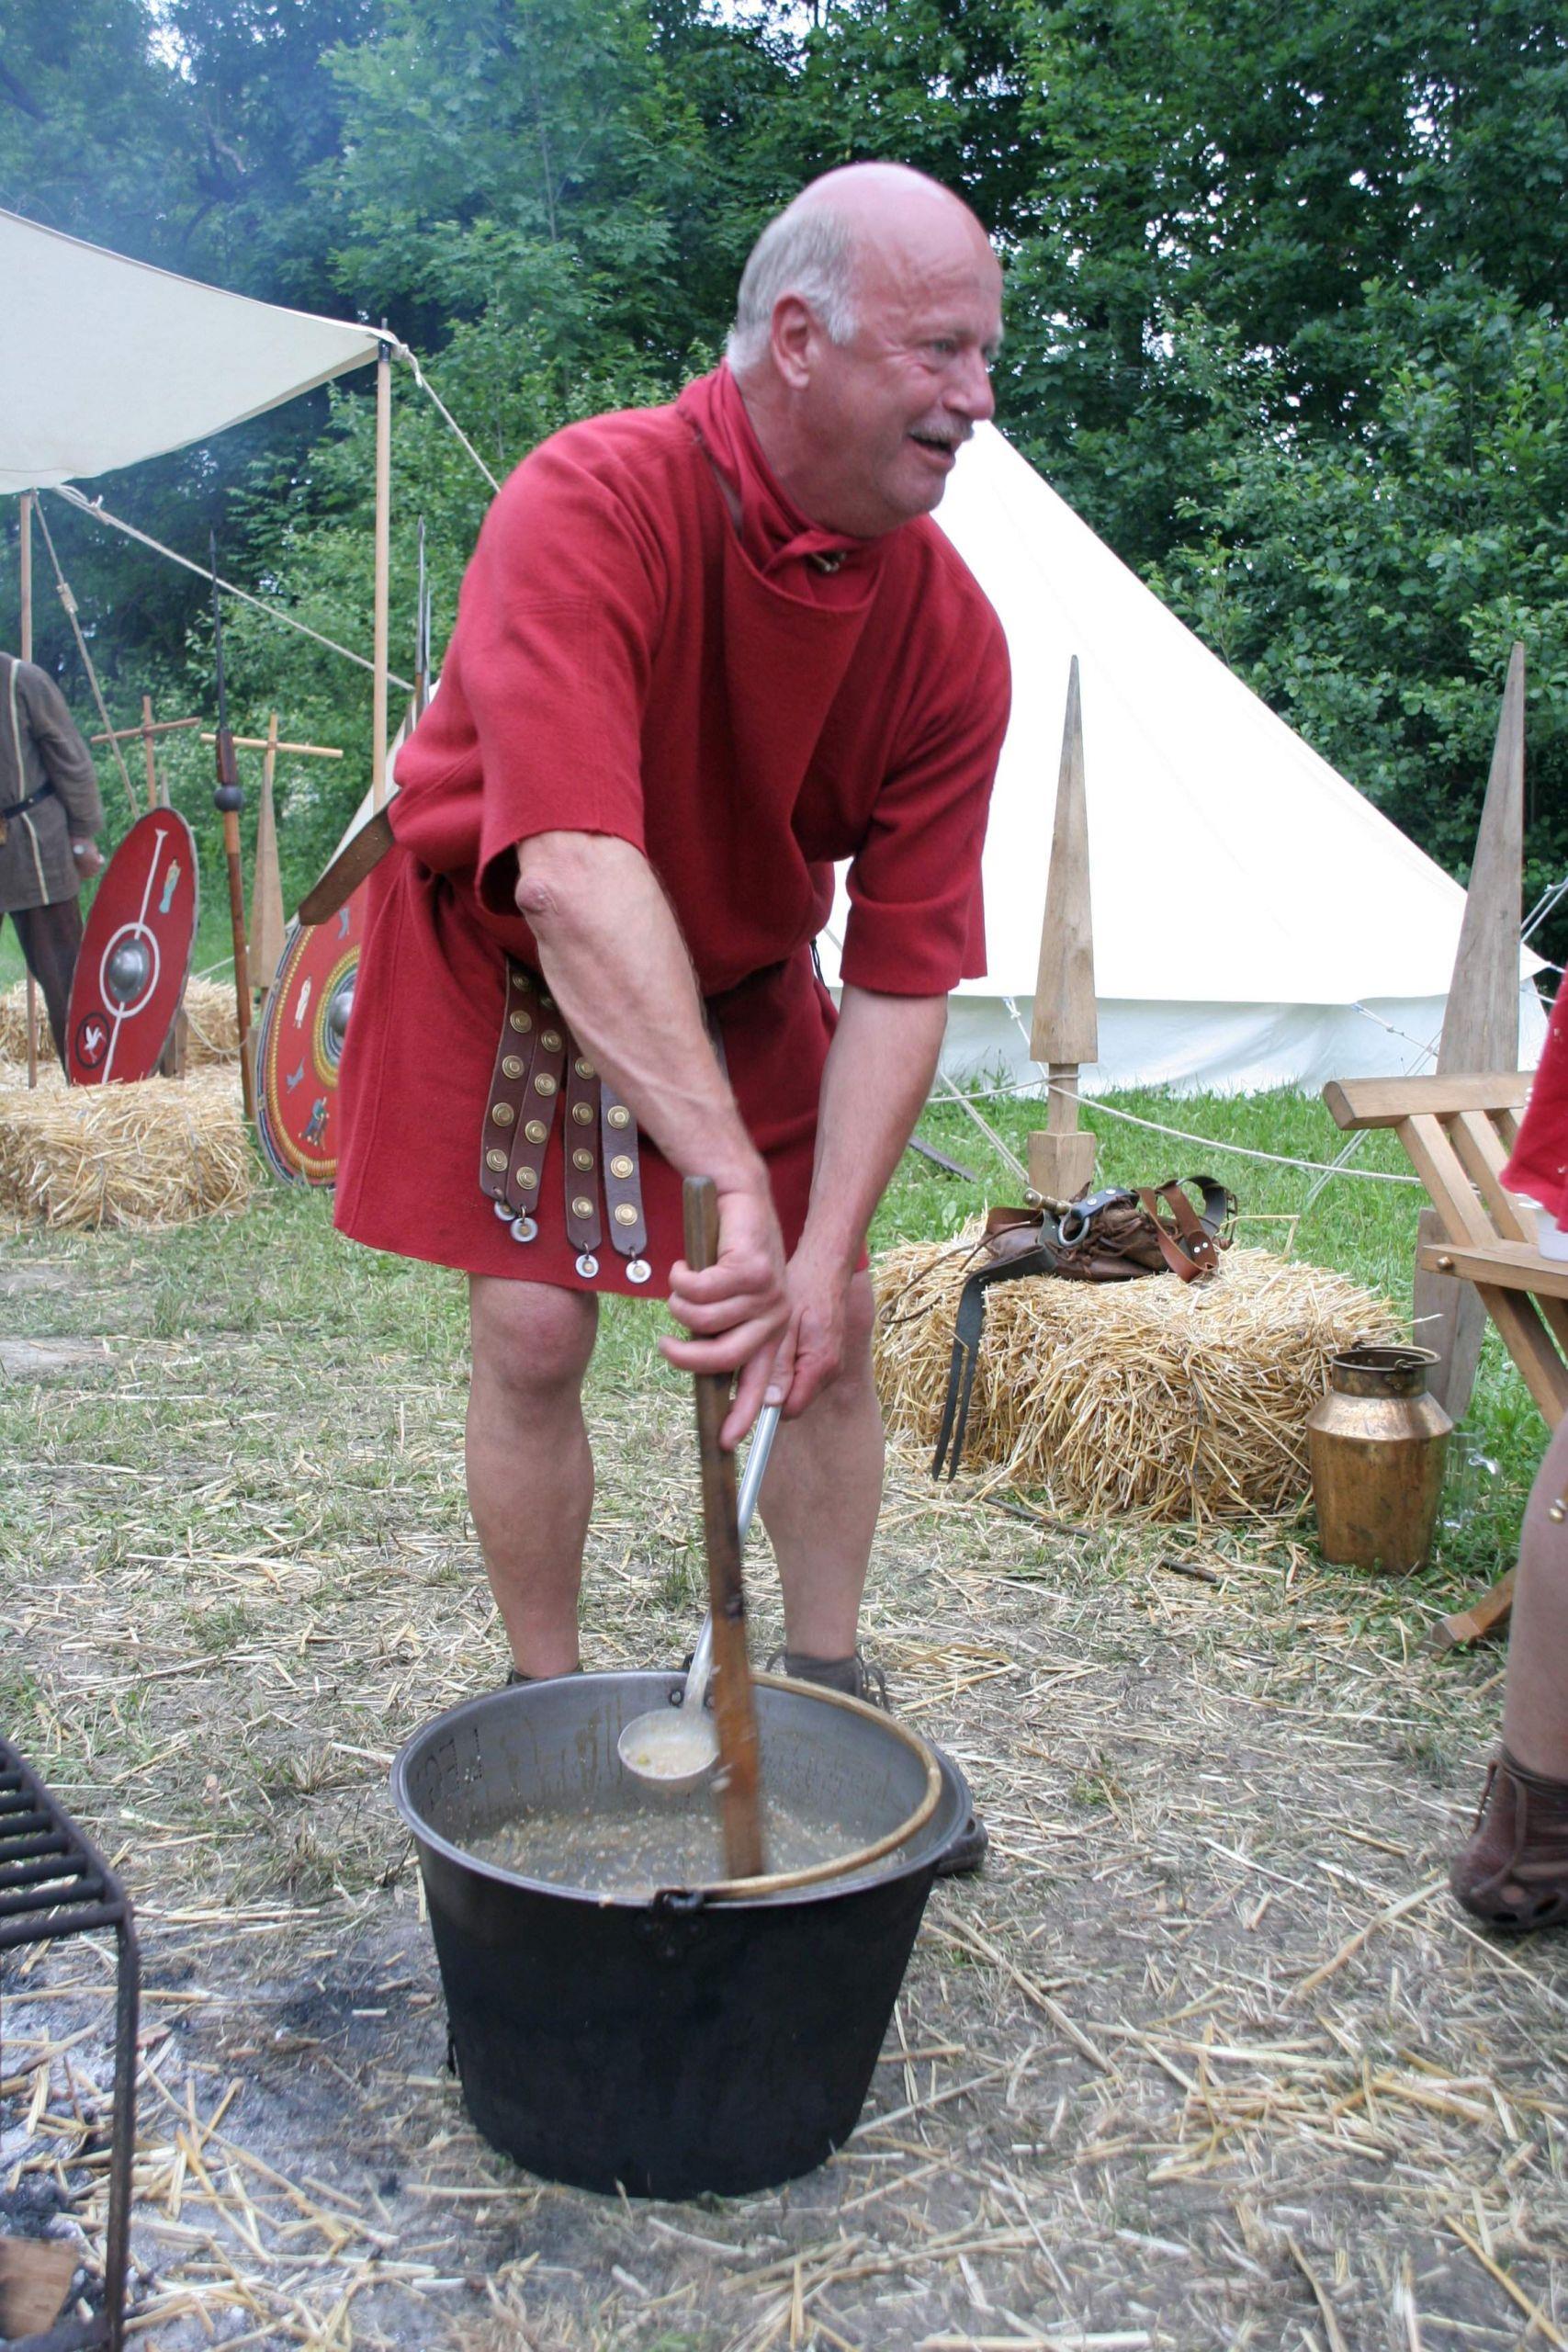 Roman sol r in tunica cooking